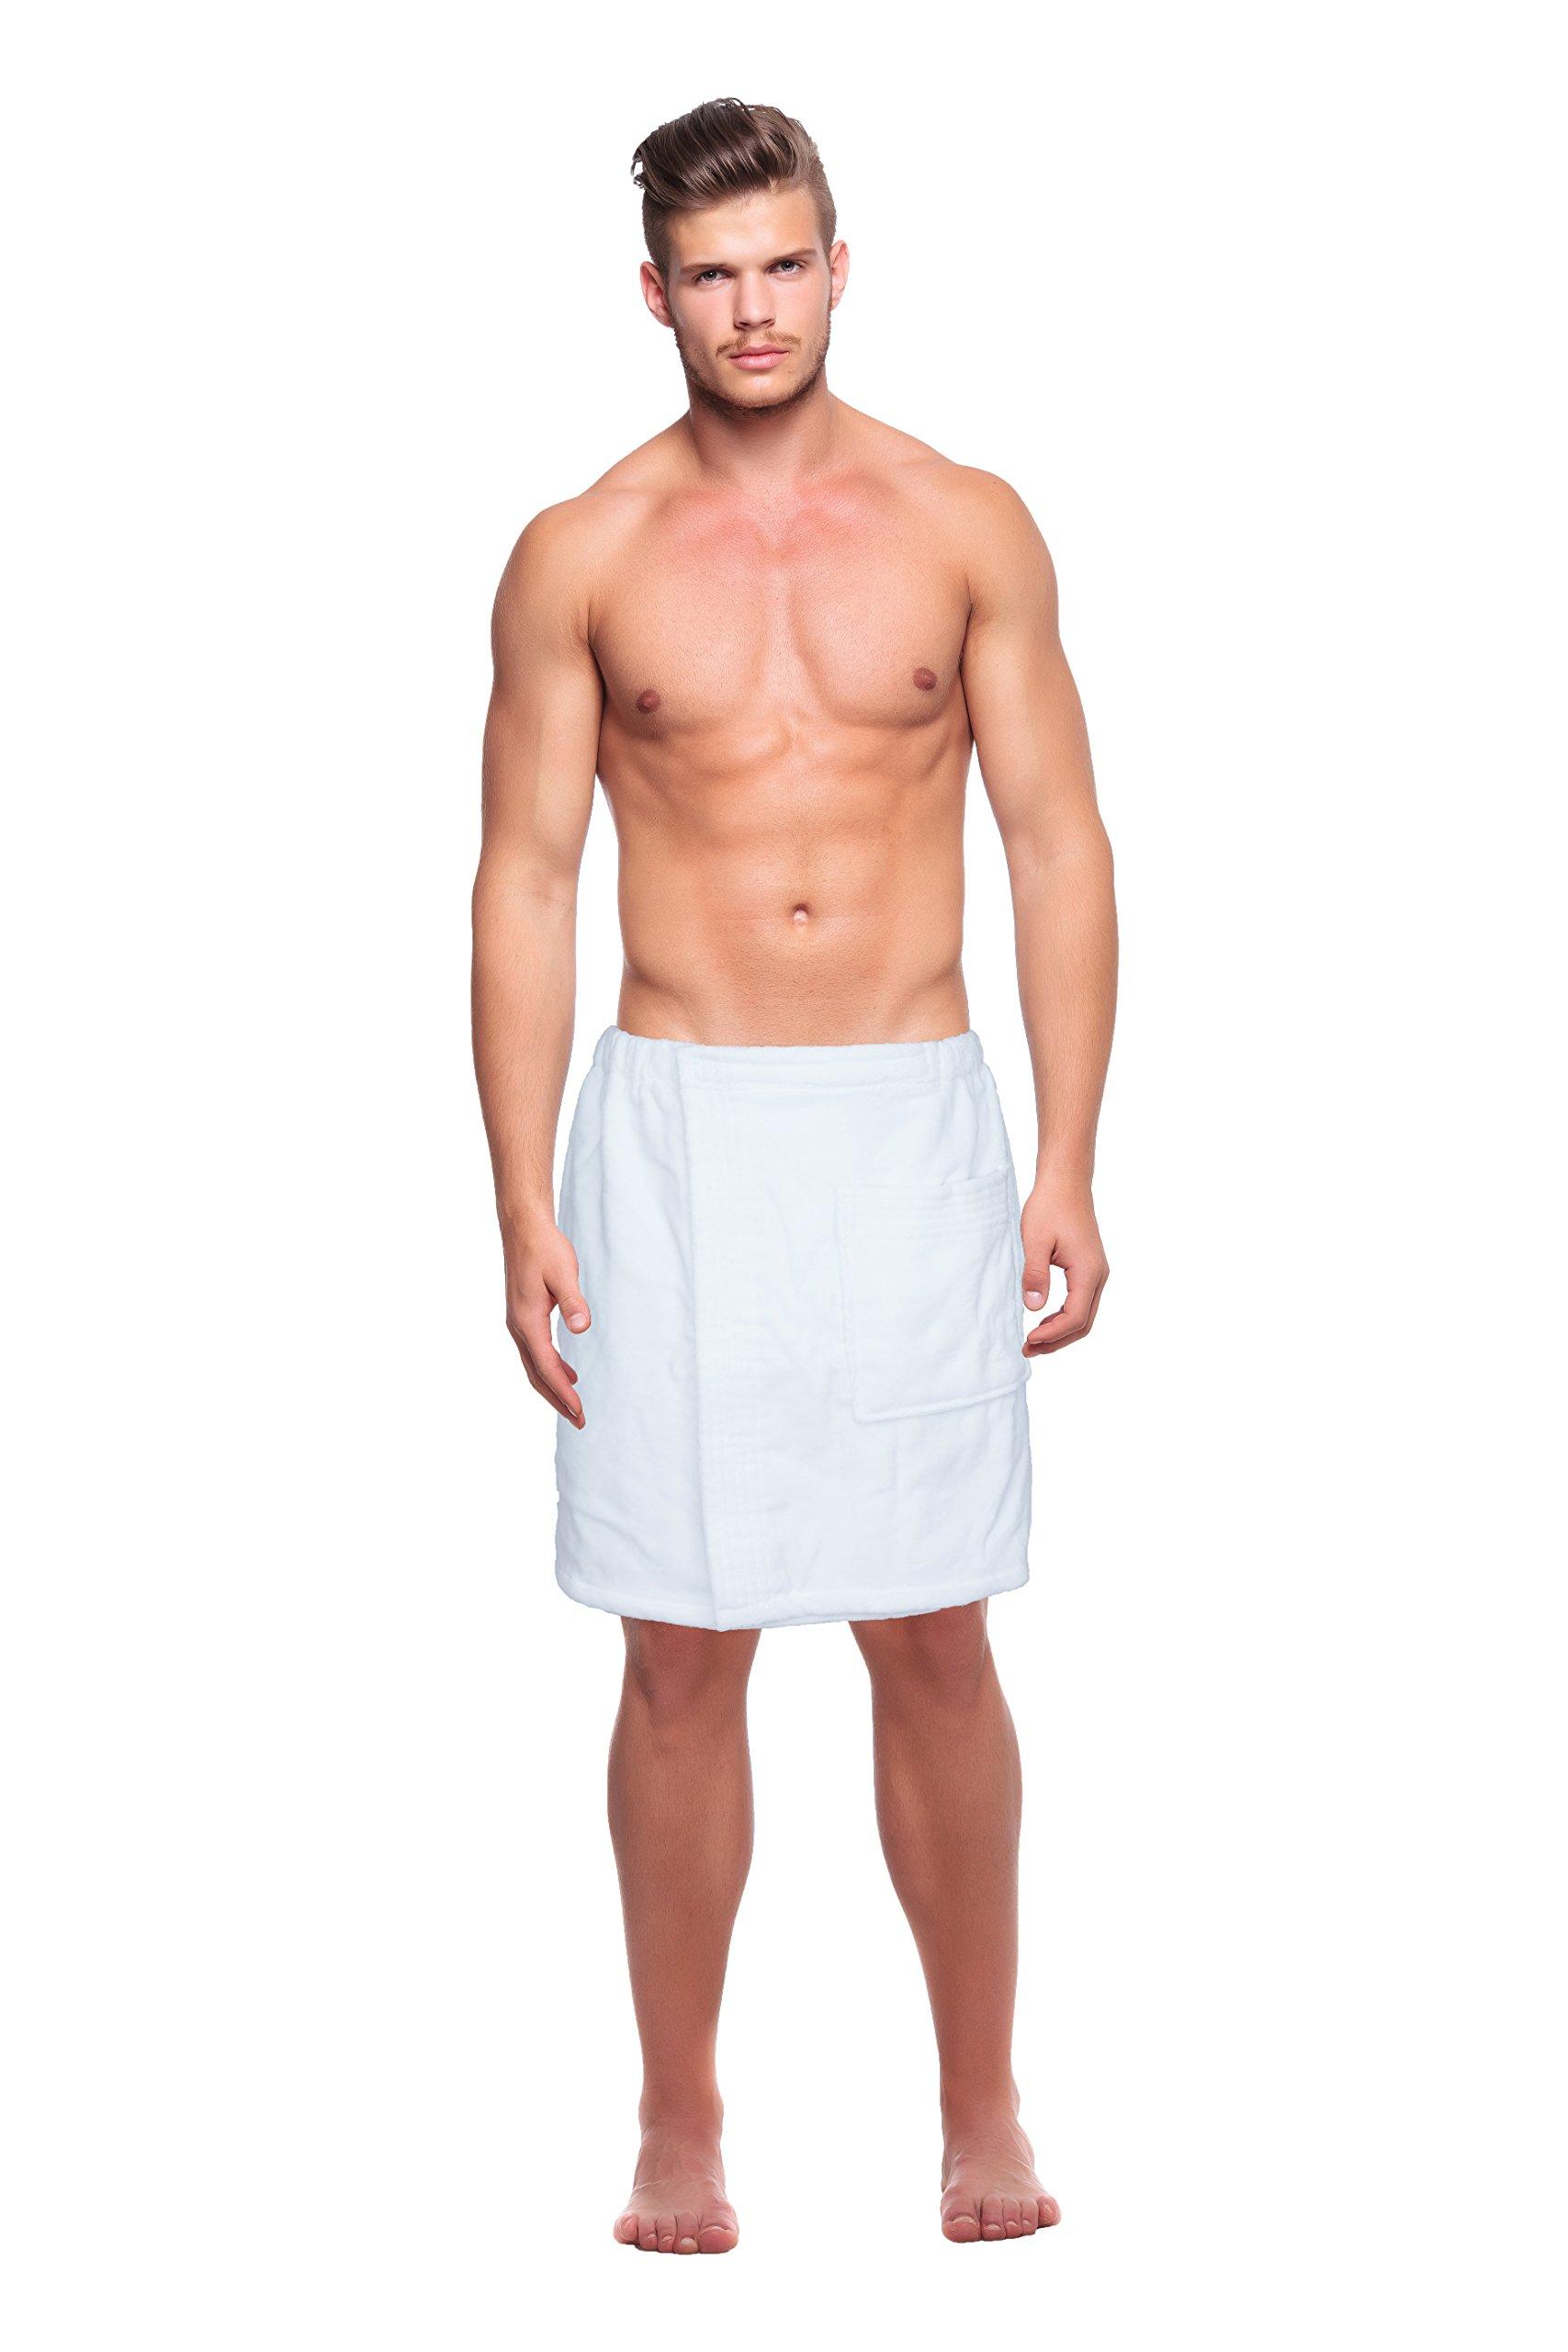 Silken Men's 100% Cotton Towels Terry Velour Body Wrap Fitness Bath Spa Pool Towel w/Adjustable Velcro (White)